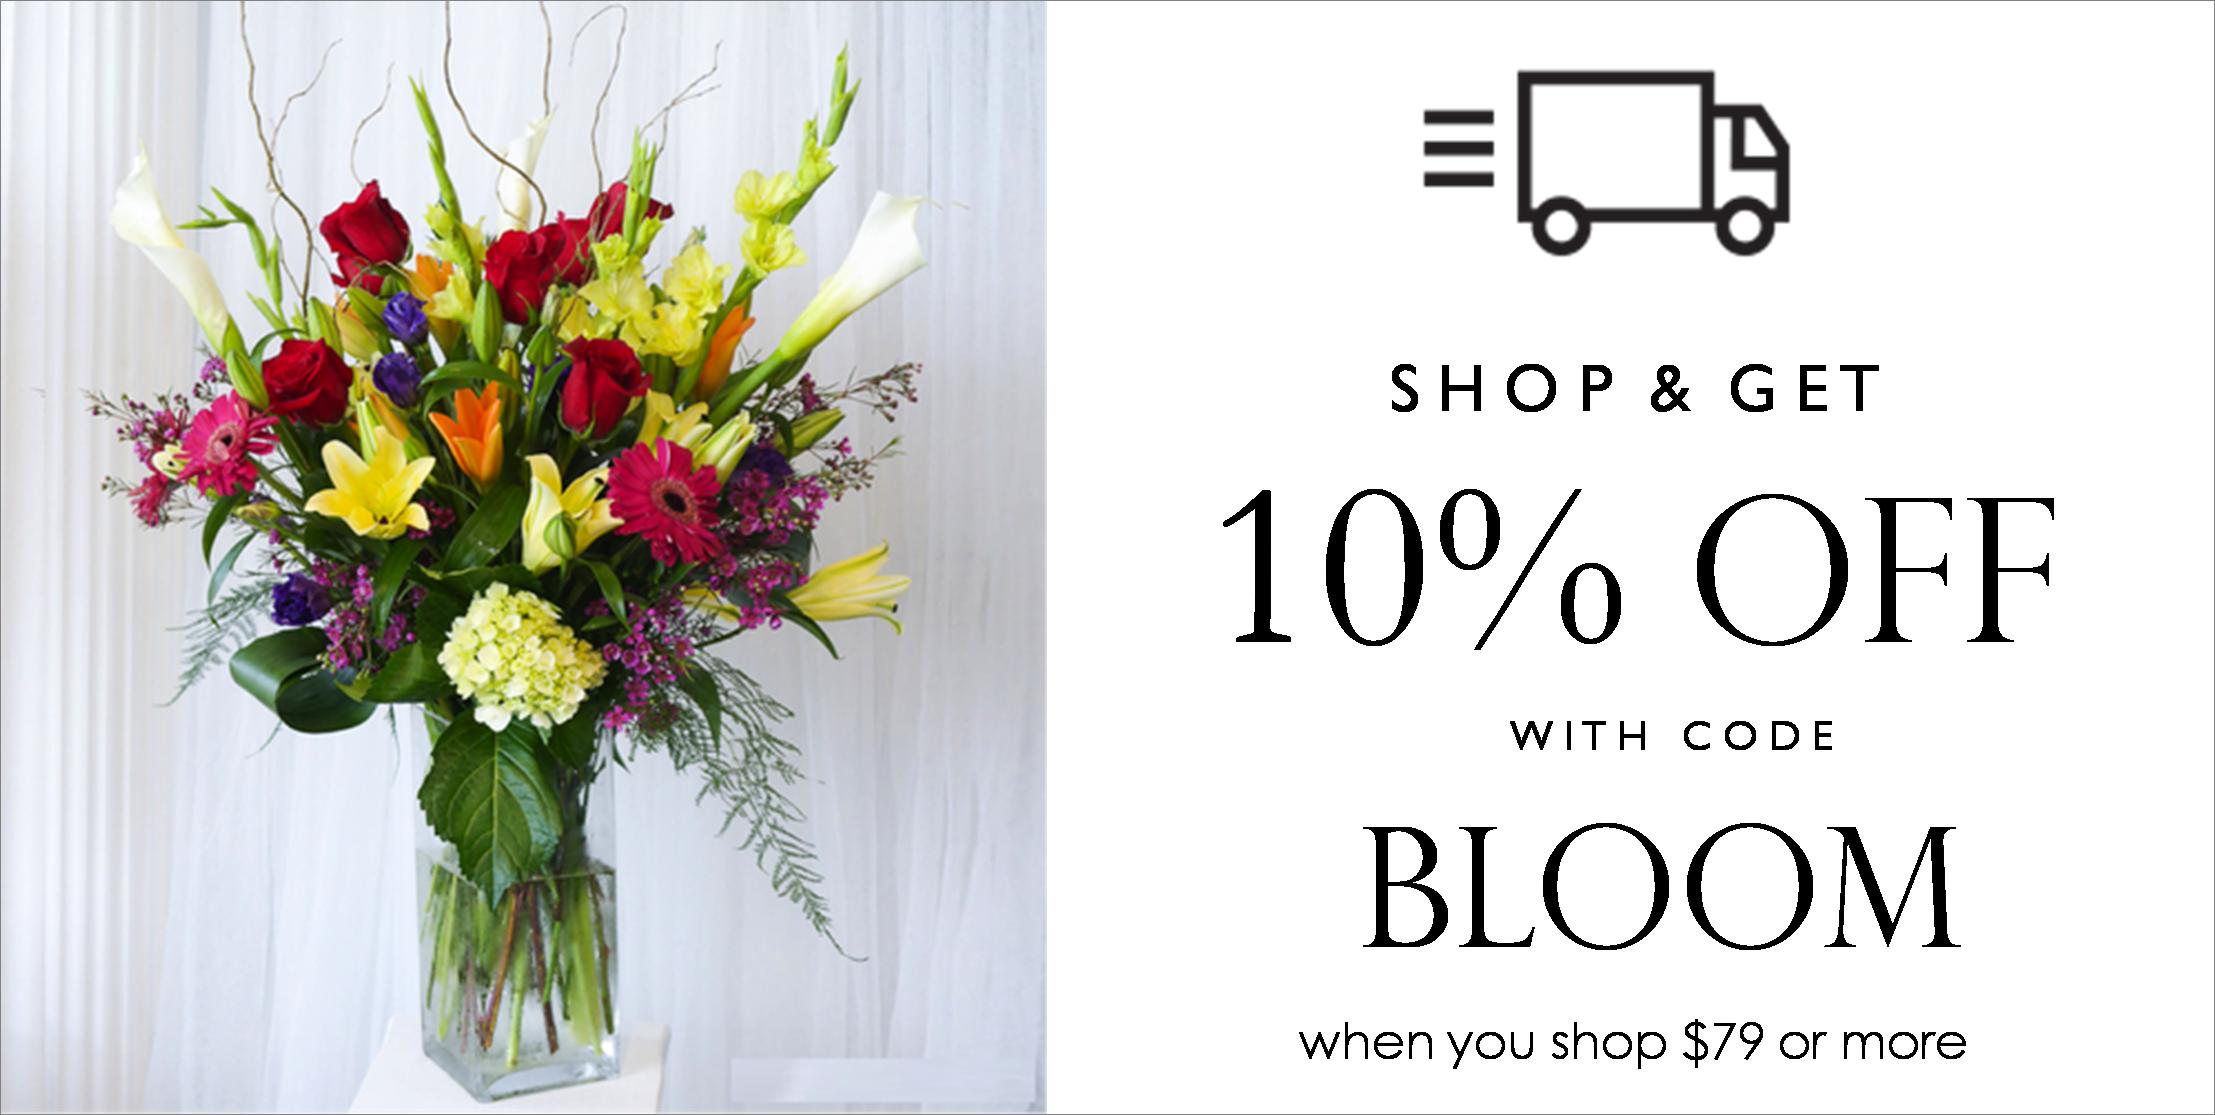 79912-we-make-el-paso-bloom-with-luxury-gifts-rose-boxes-angies-floral-designs-angies-we-make-el-paso-el-paso-florist-birthday-bloom-floral-same-day-sympathy-deliverydesigns-rose-delivery-el-paso-florist-angies-flower.png